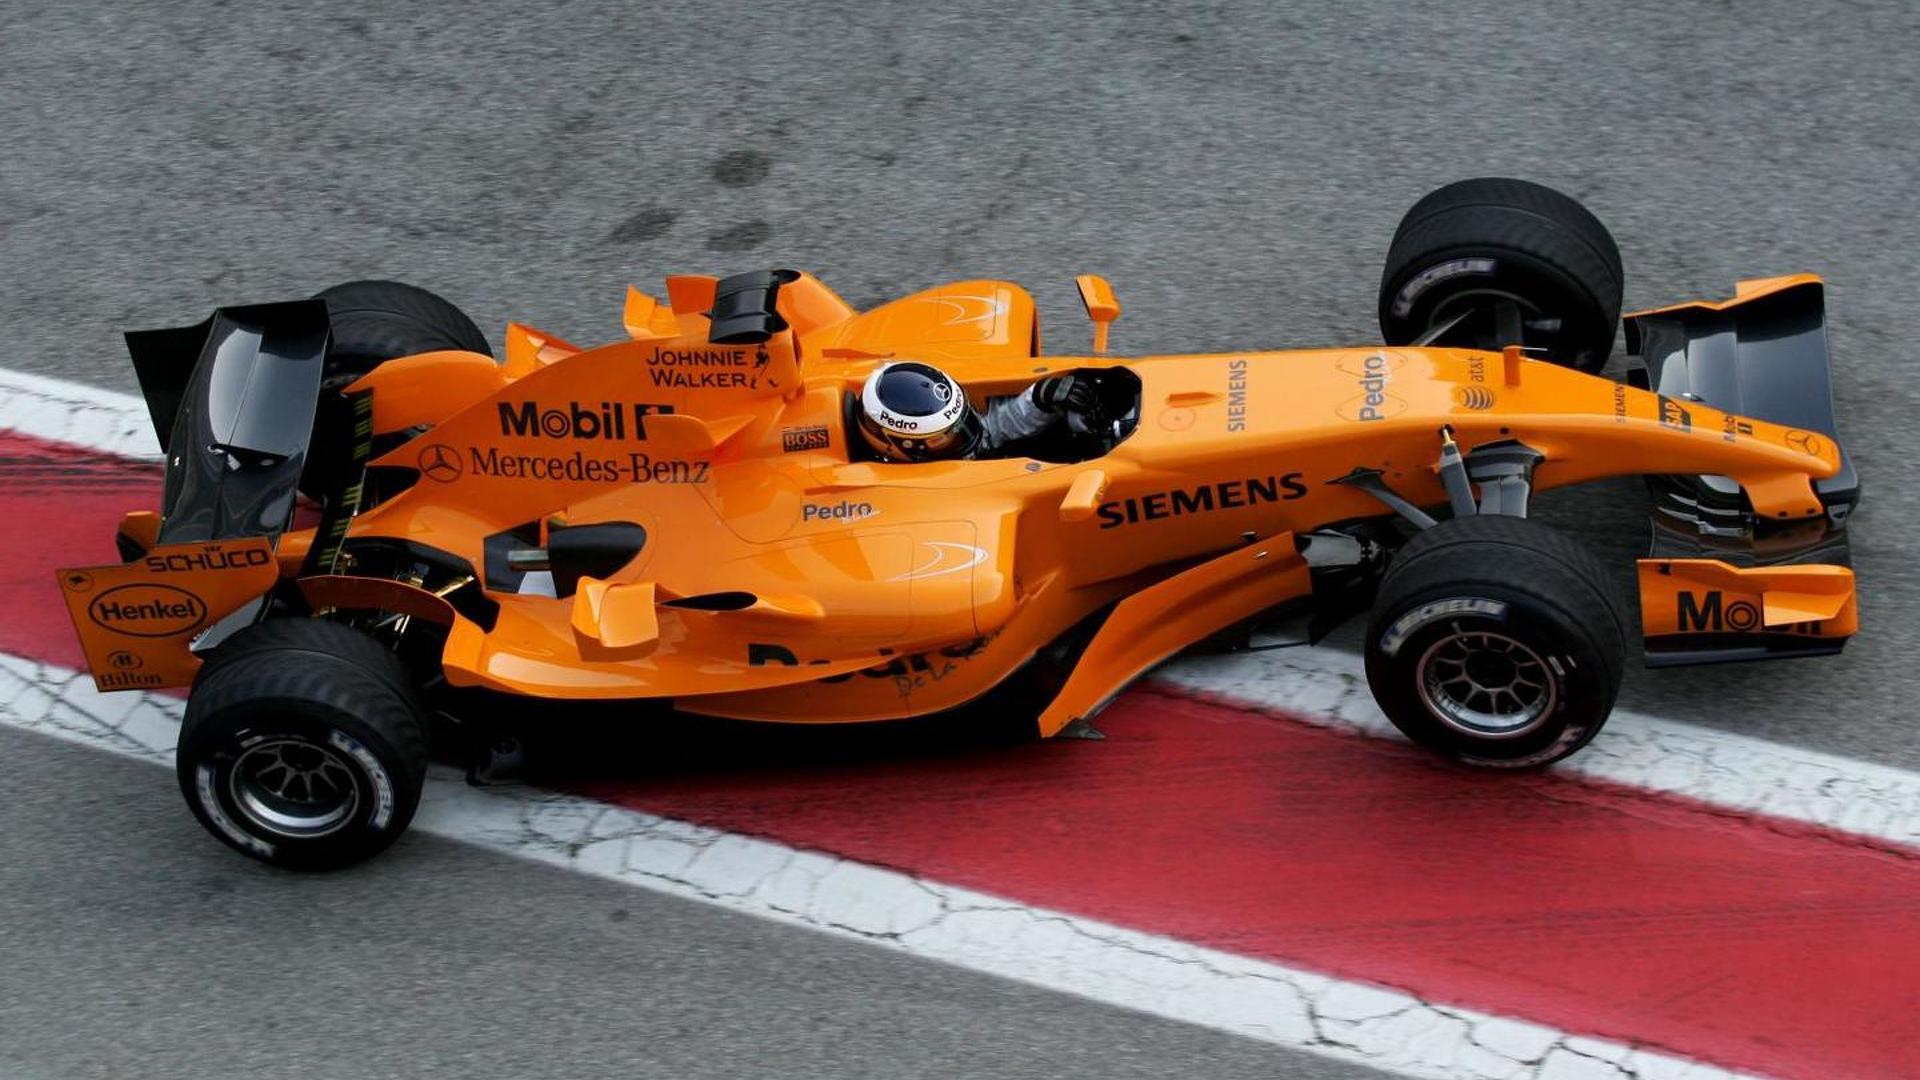 2013-437514-pedro-de-la-rosa-in-mclaren-mp4-21-23-01-2006-formula-one-testing-circuit-de-c1.jpg